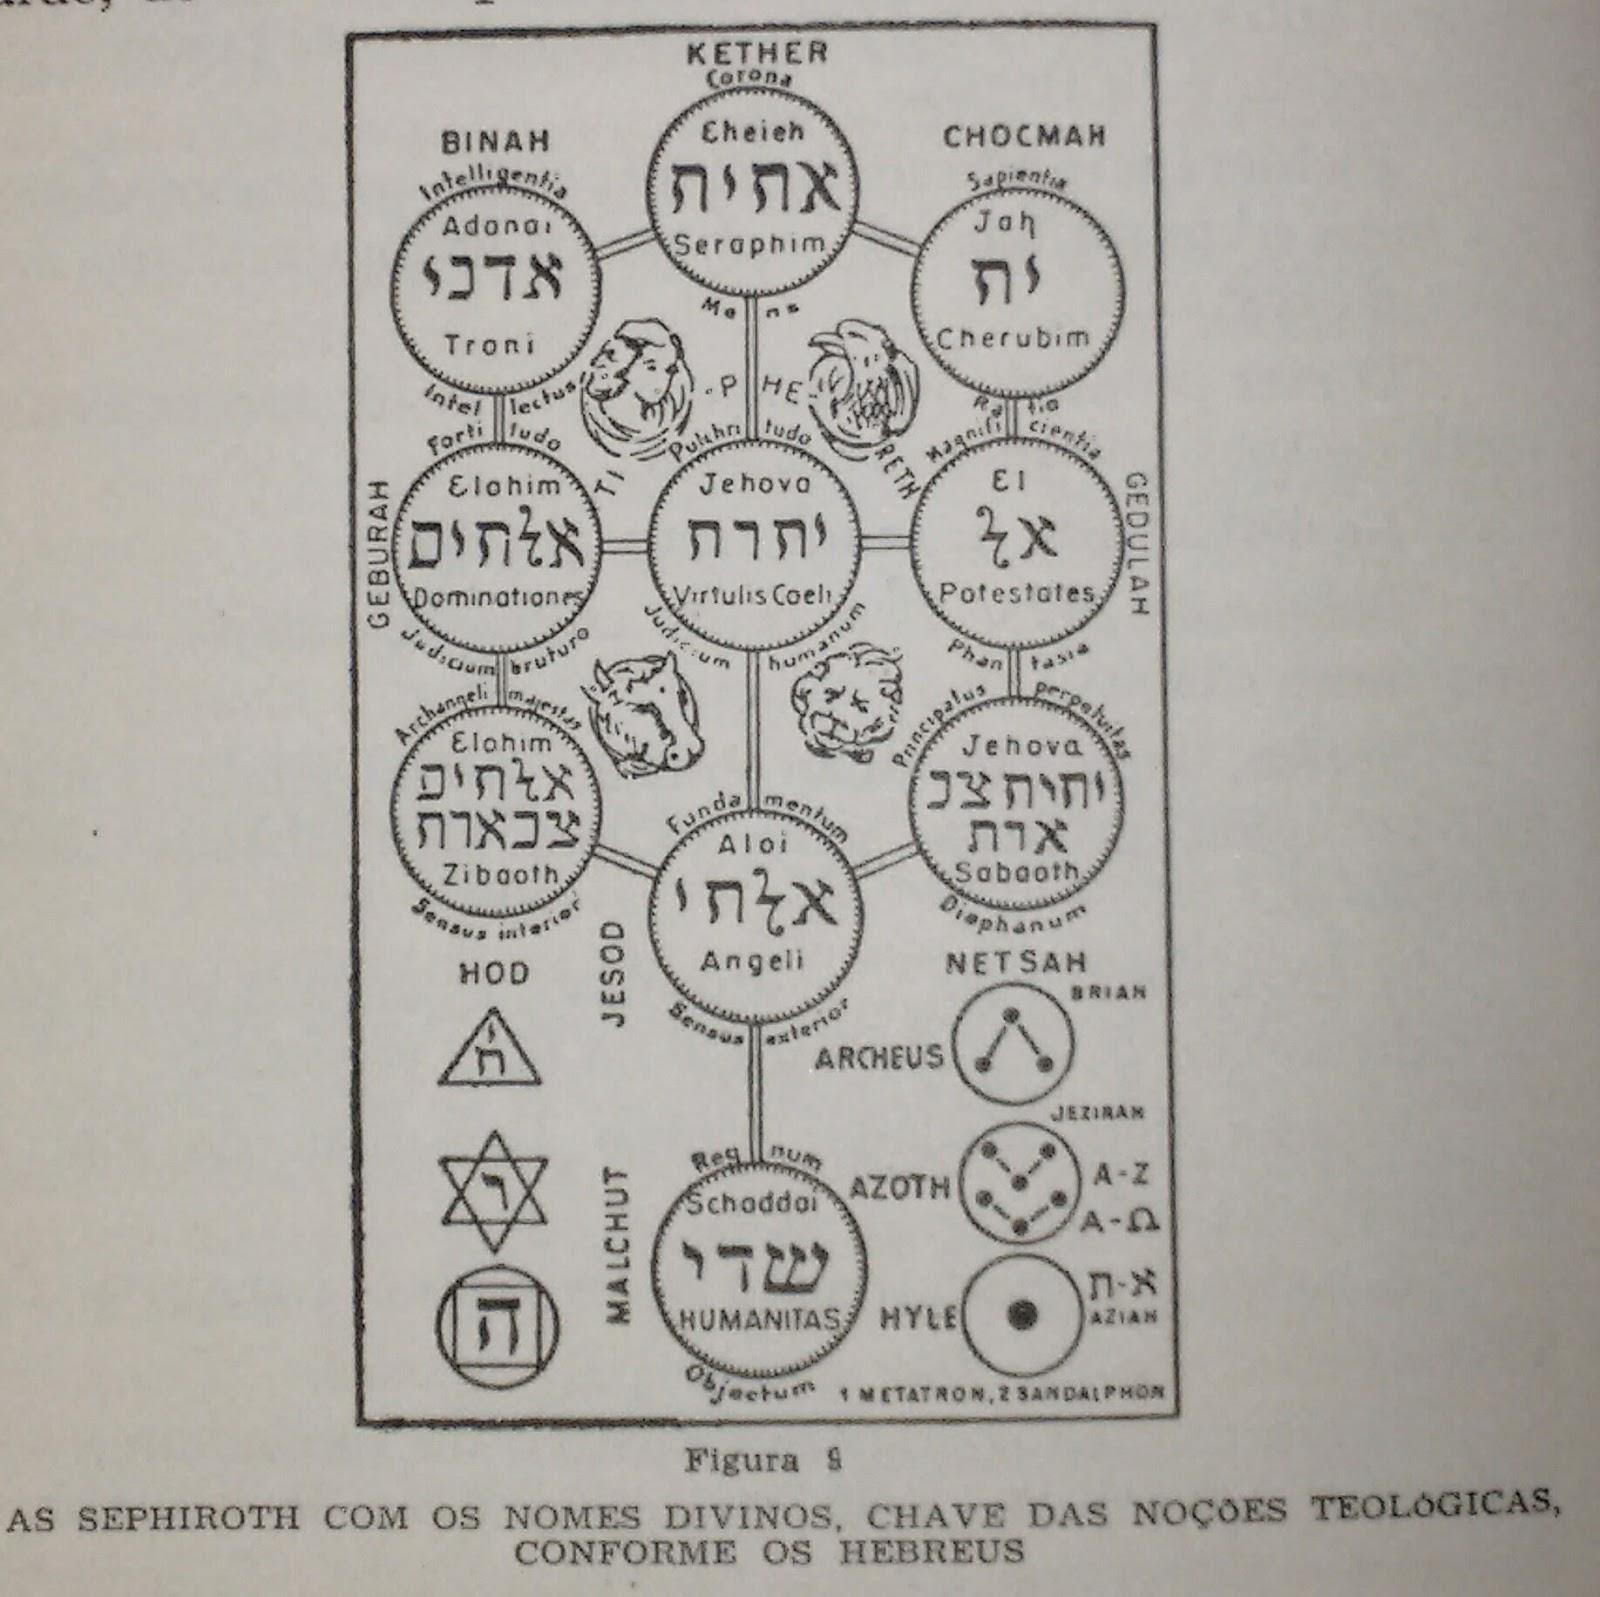 A Chave Dos Grandes Mistérios - Conforme Enoch, Abraão